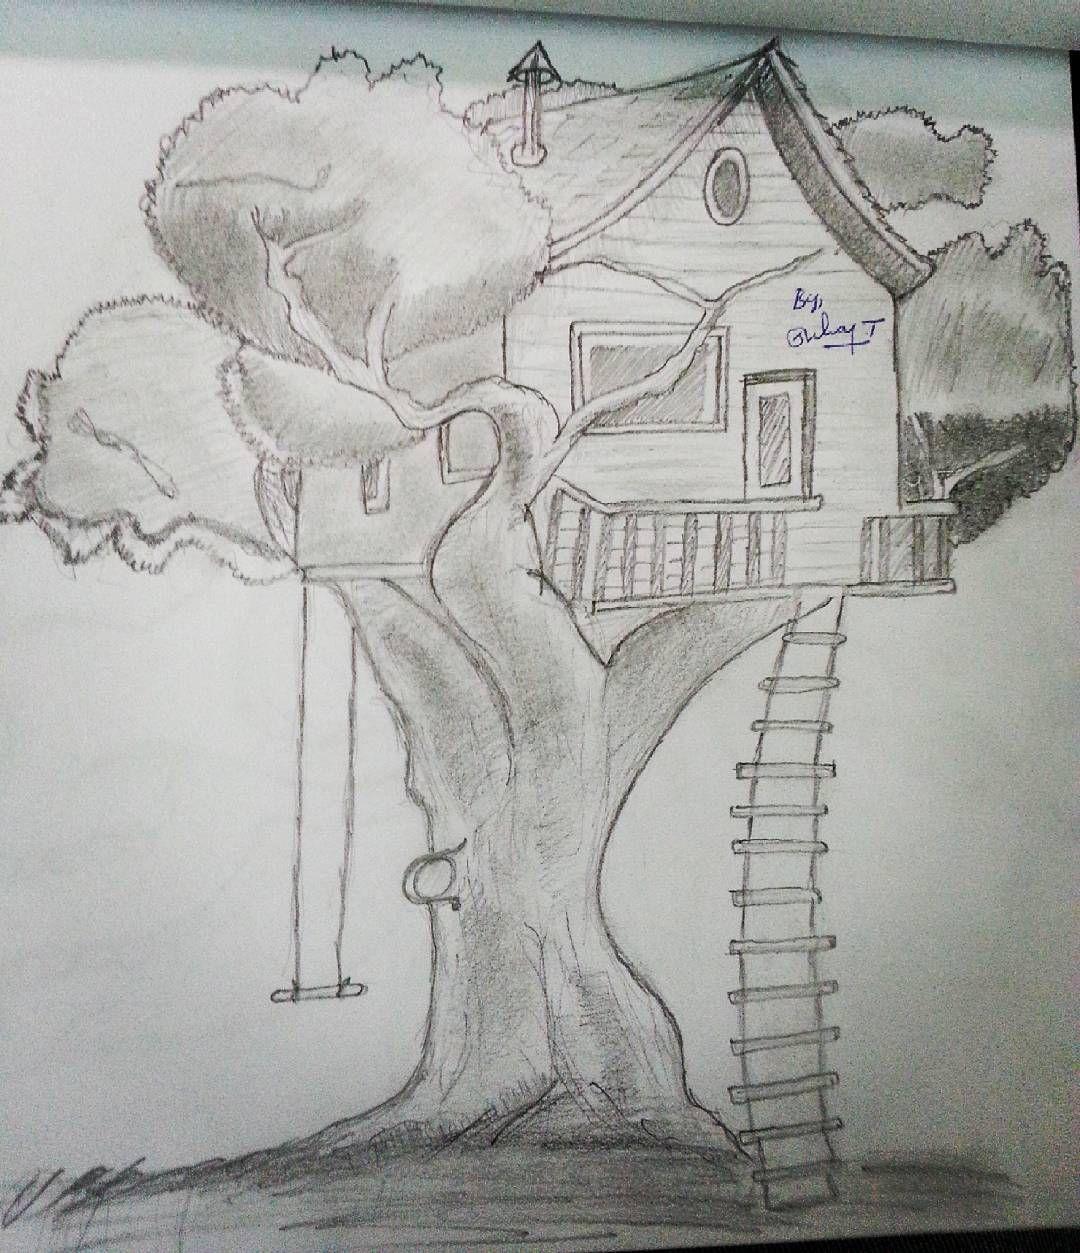 Tree house pencil drawing drawingoftheday pencil pencildrawing drawing art easydrawing beginers